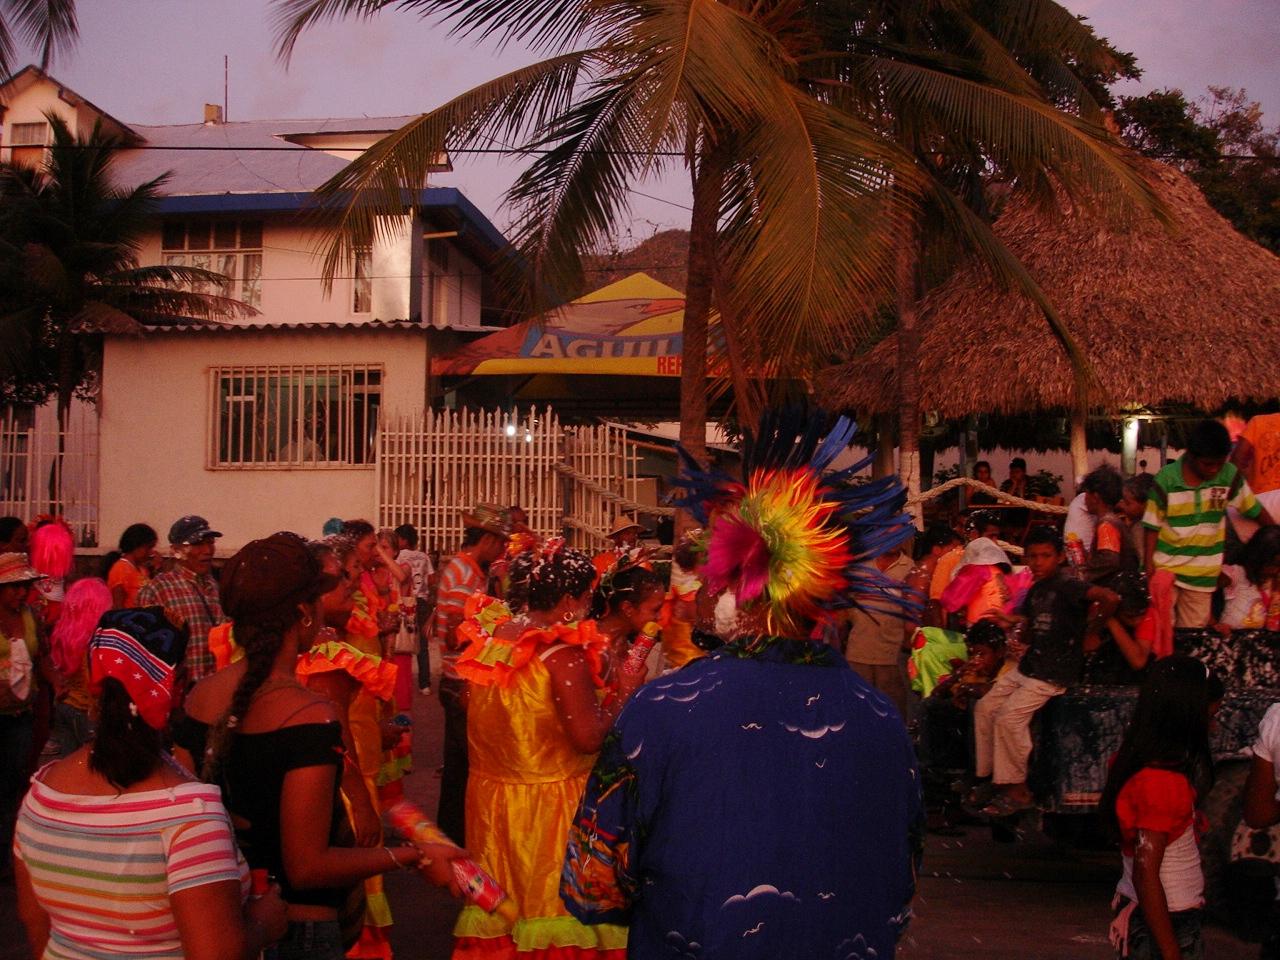 Colombia, Taganga